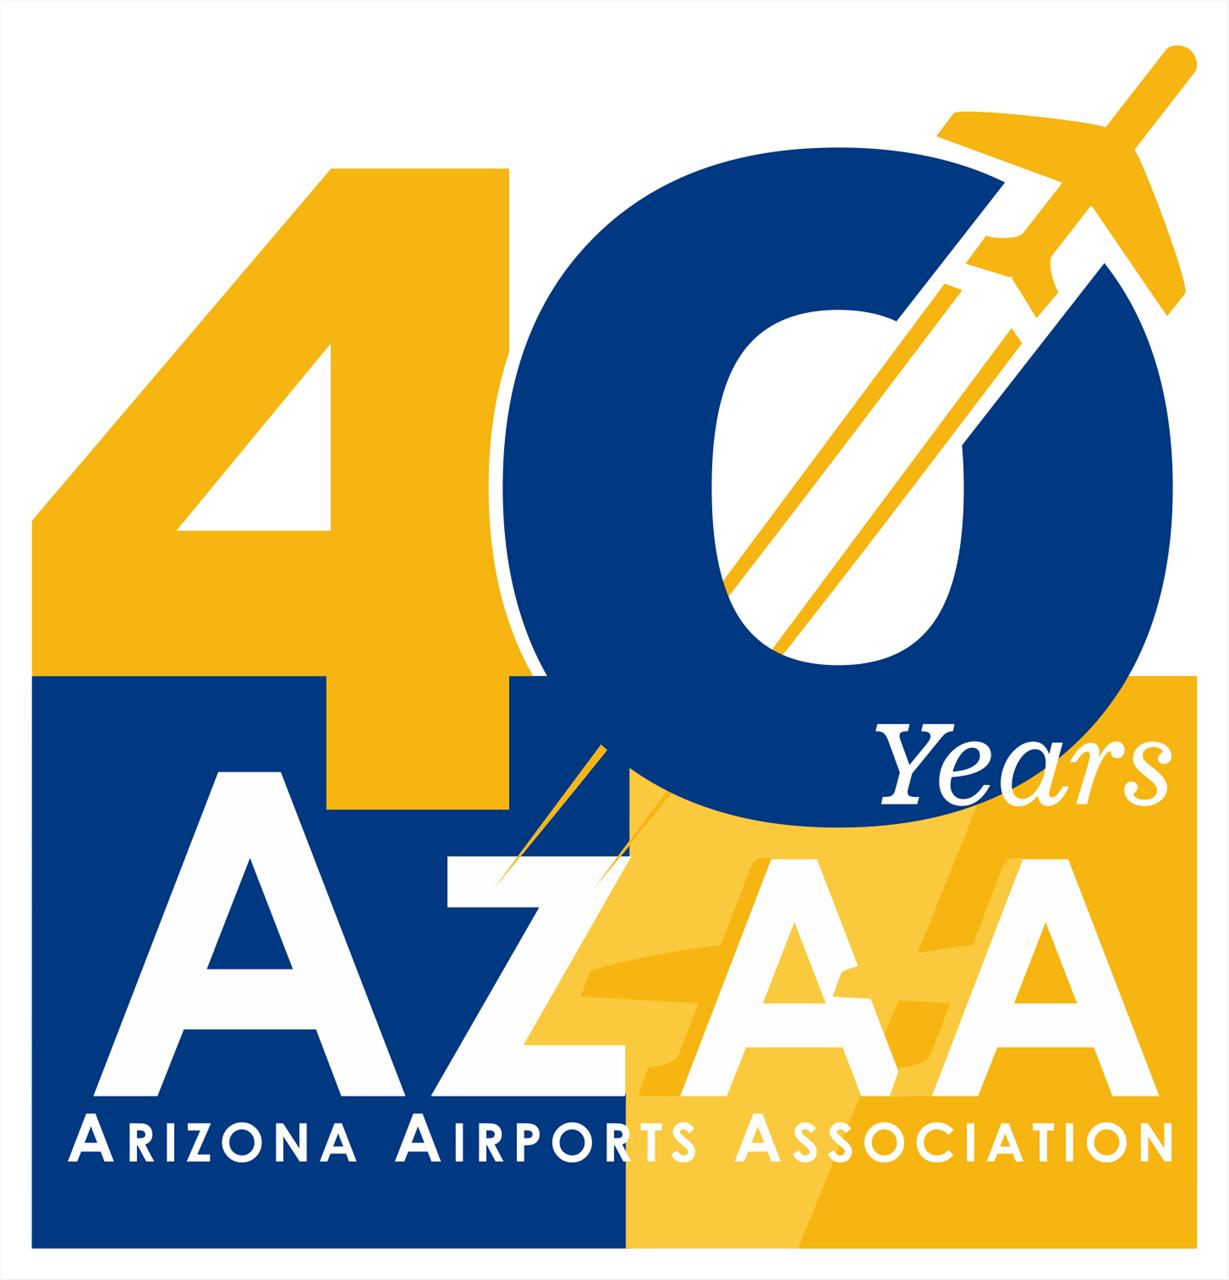 Arizona Airports Association - 2019 AzAA